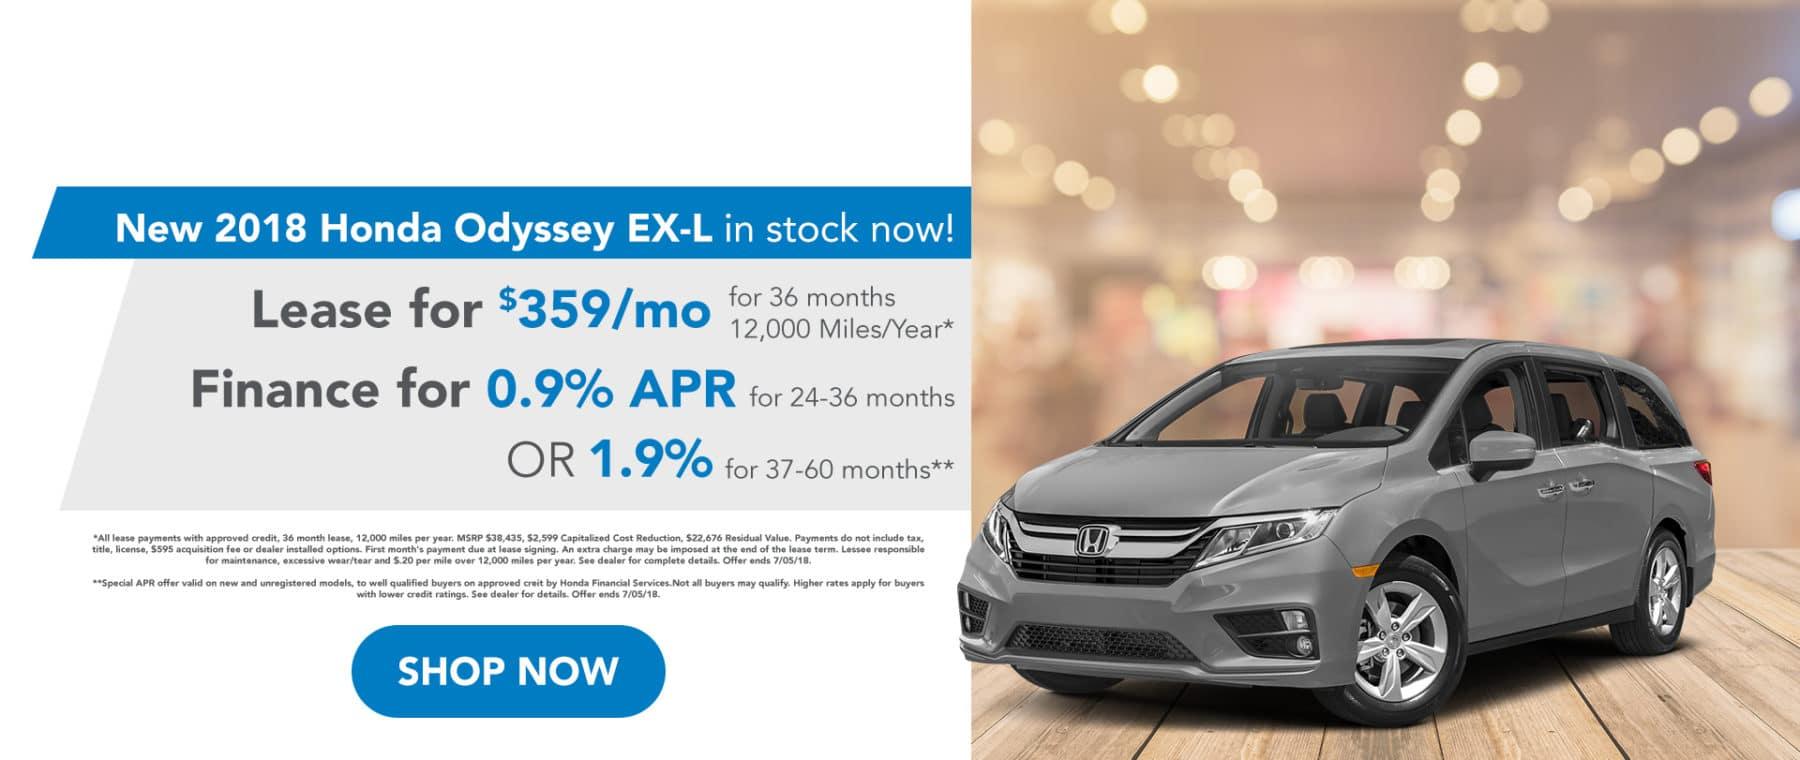 Richards Honda Odyssey June Special Offer